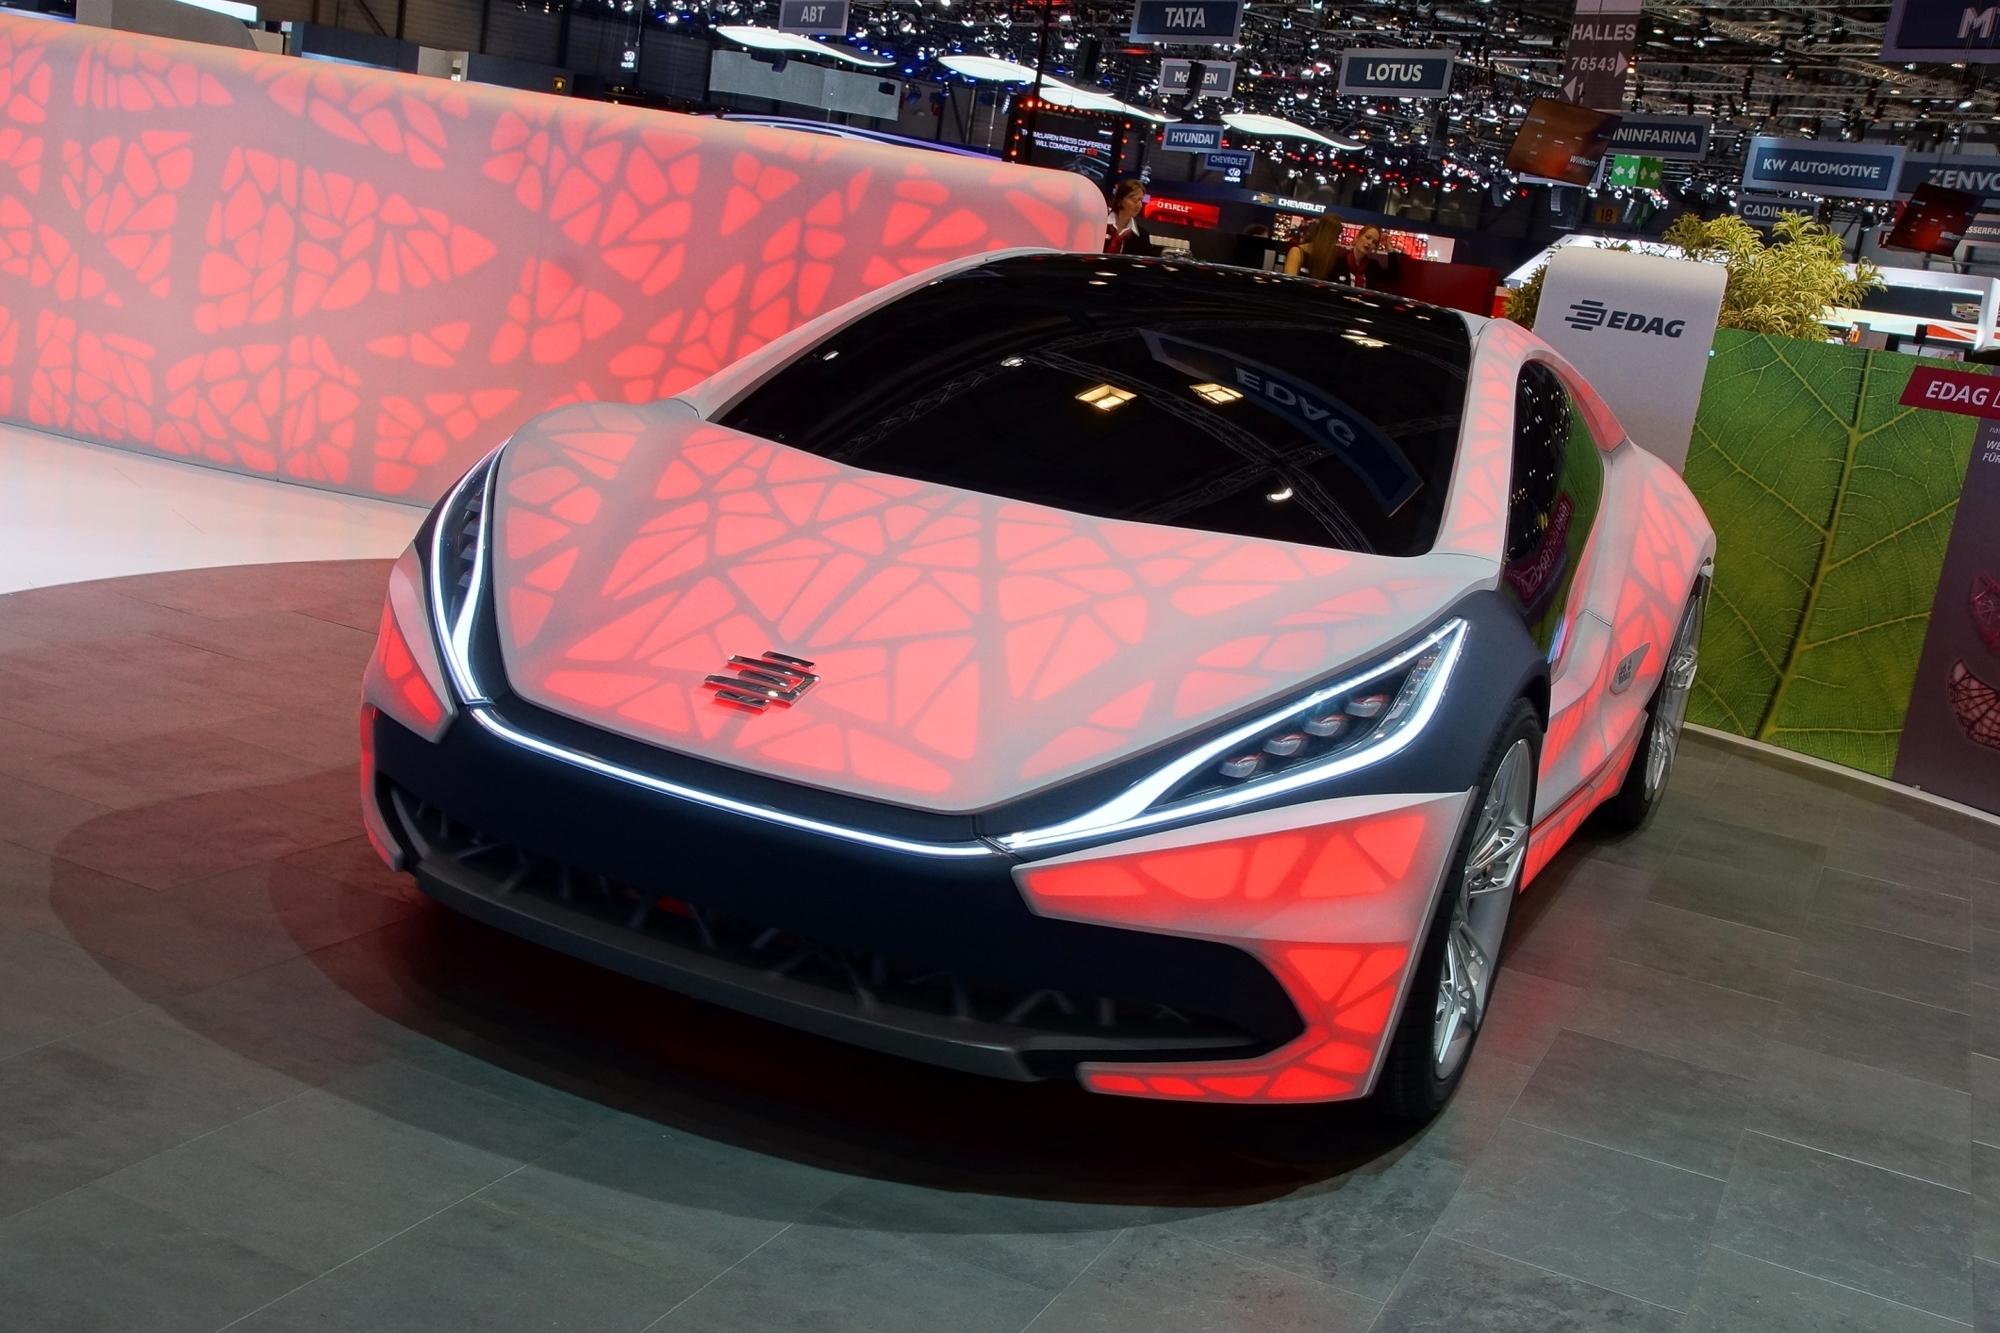 Konzept-Fahrzeuge auf dem Genfer Salon - Verrückt entzückt